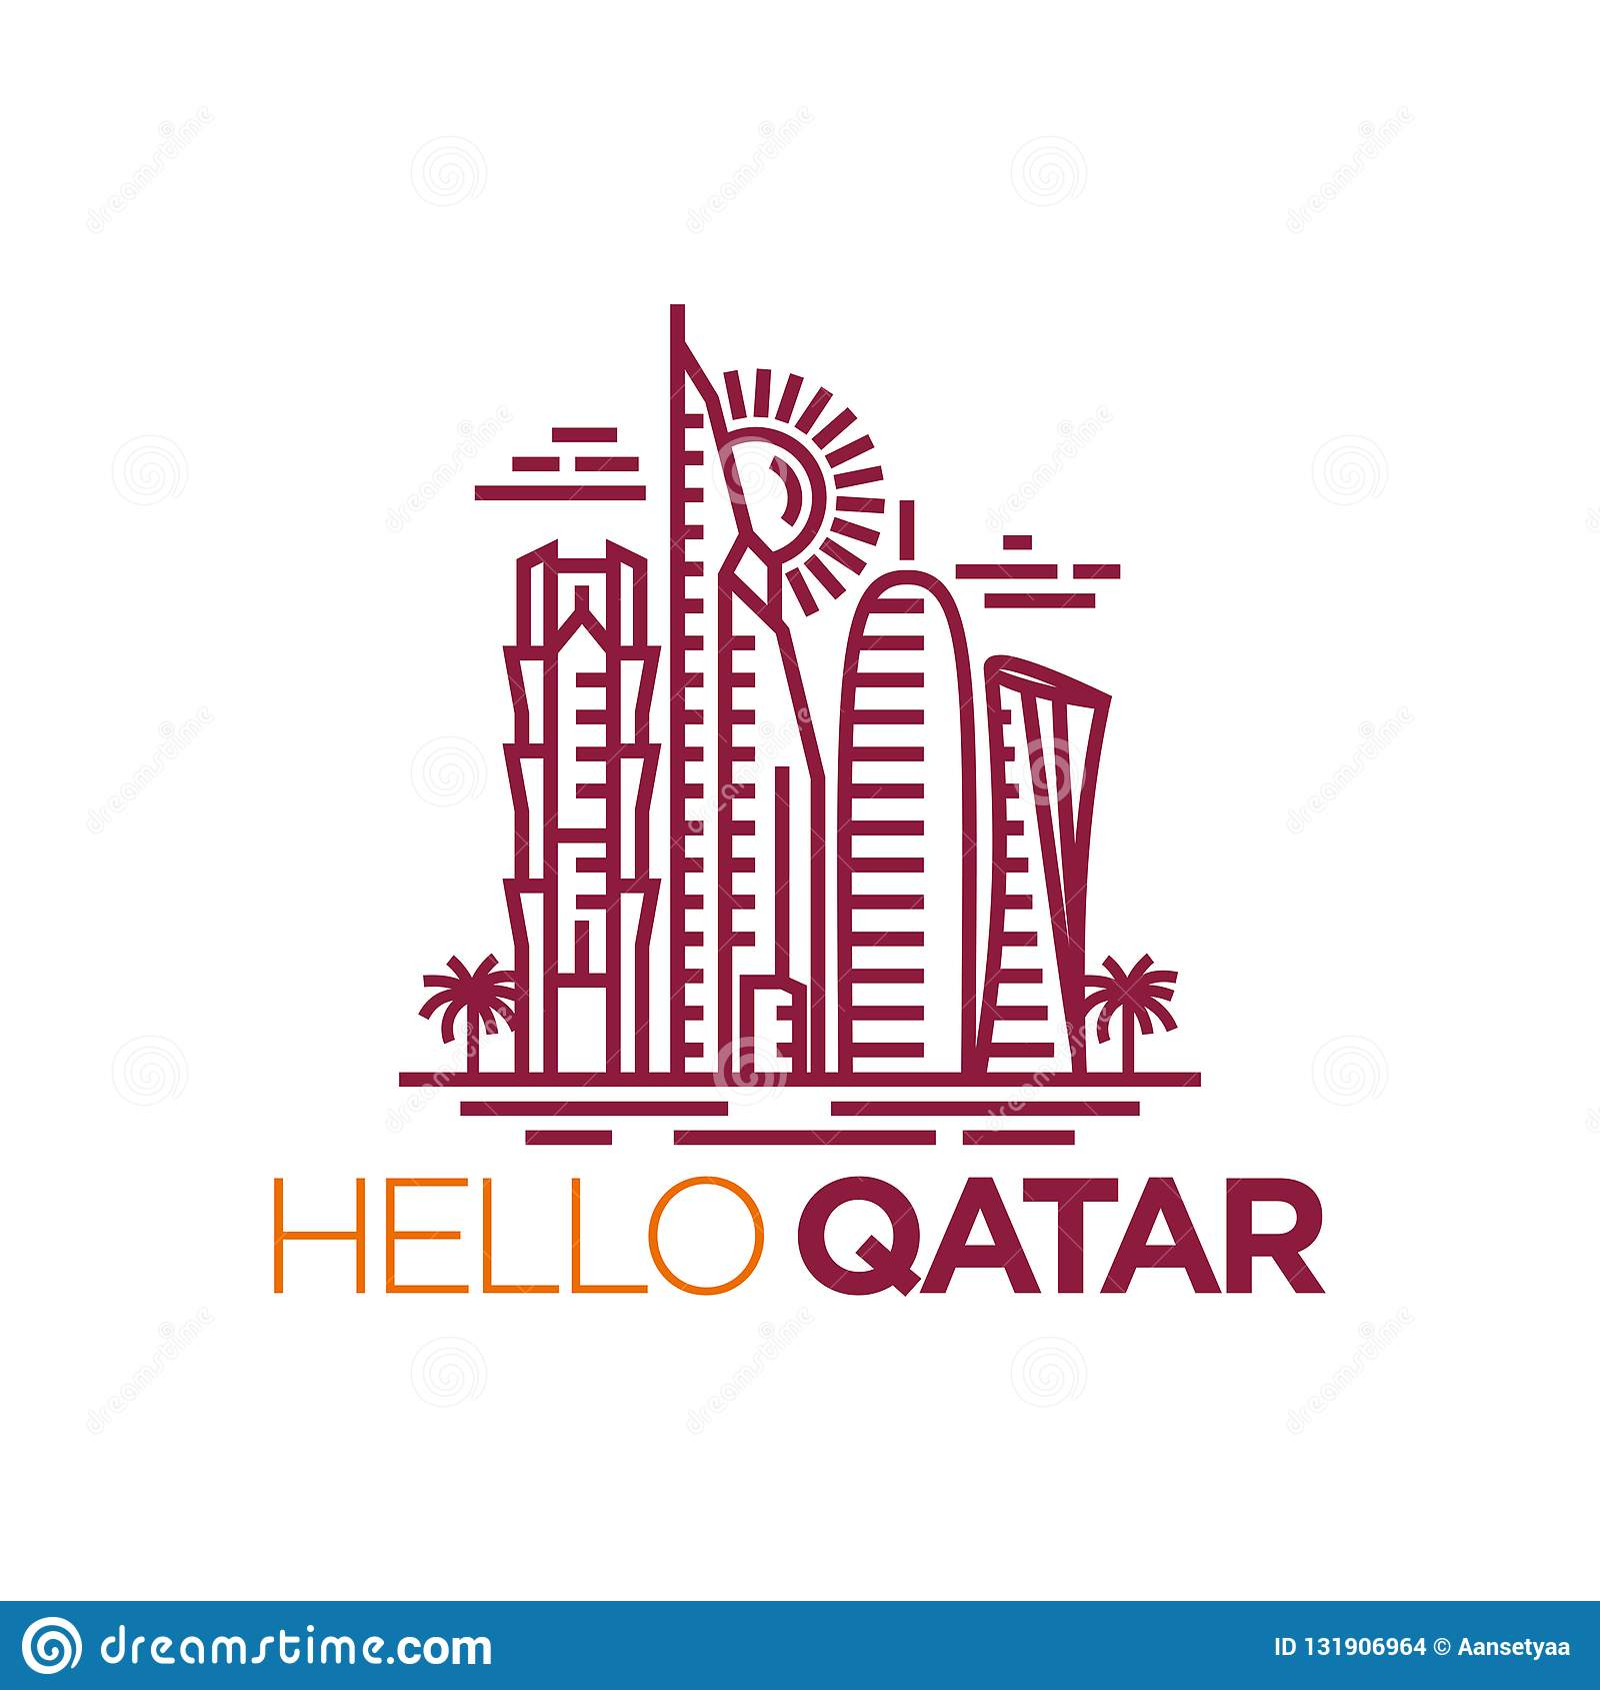 Qatar City Tower Logo Design Inspiration Qatar Tower Vector Stock Vector Illustration Of Arabia Financial 131906964